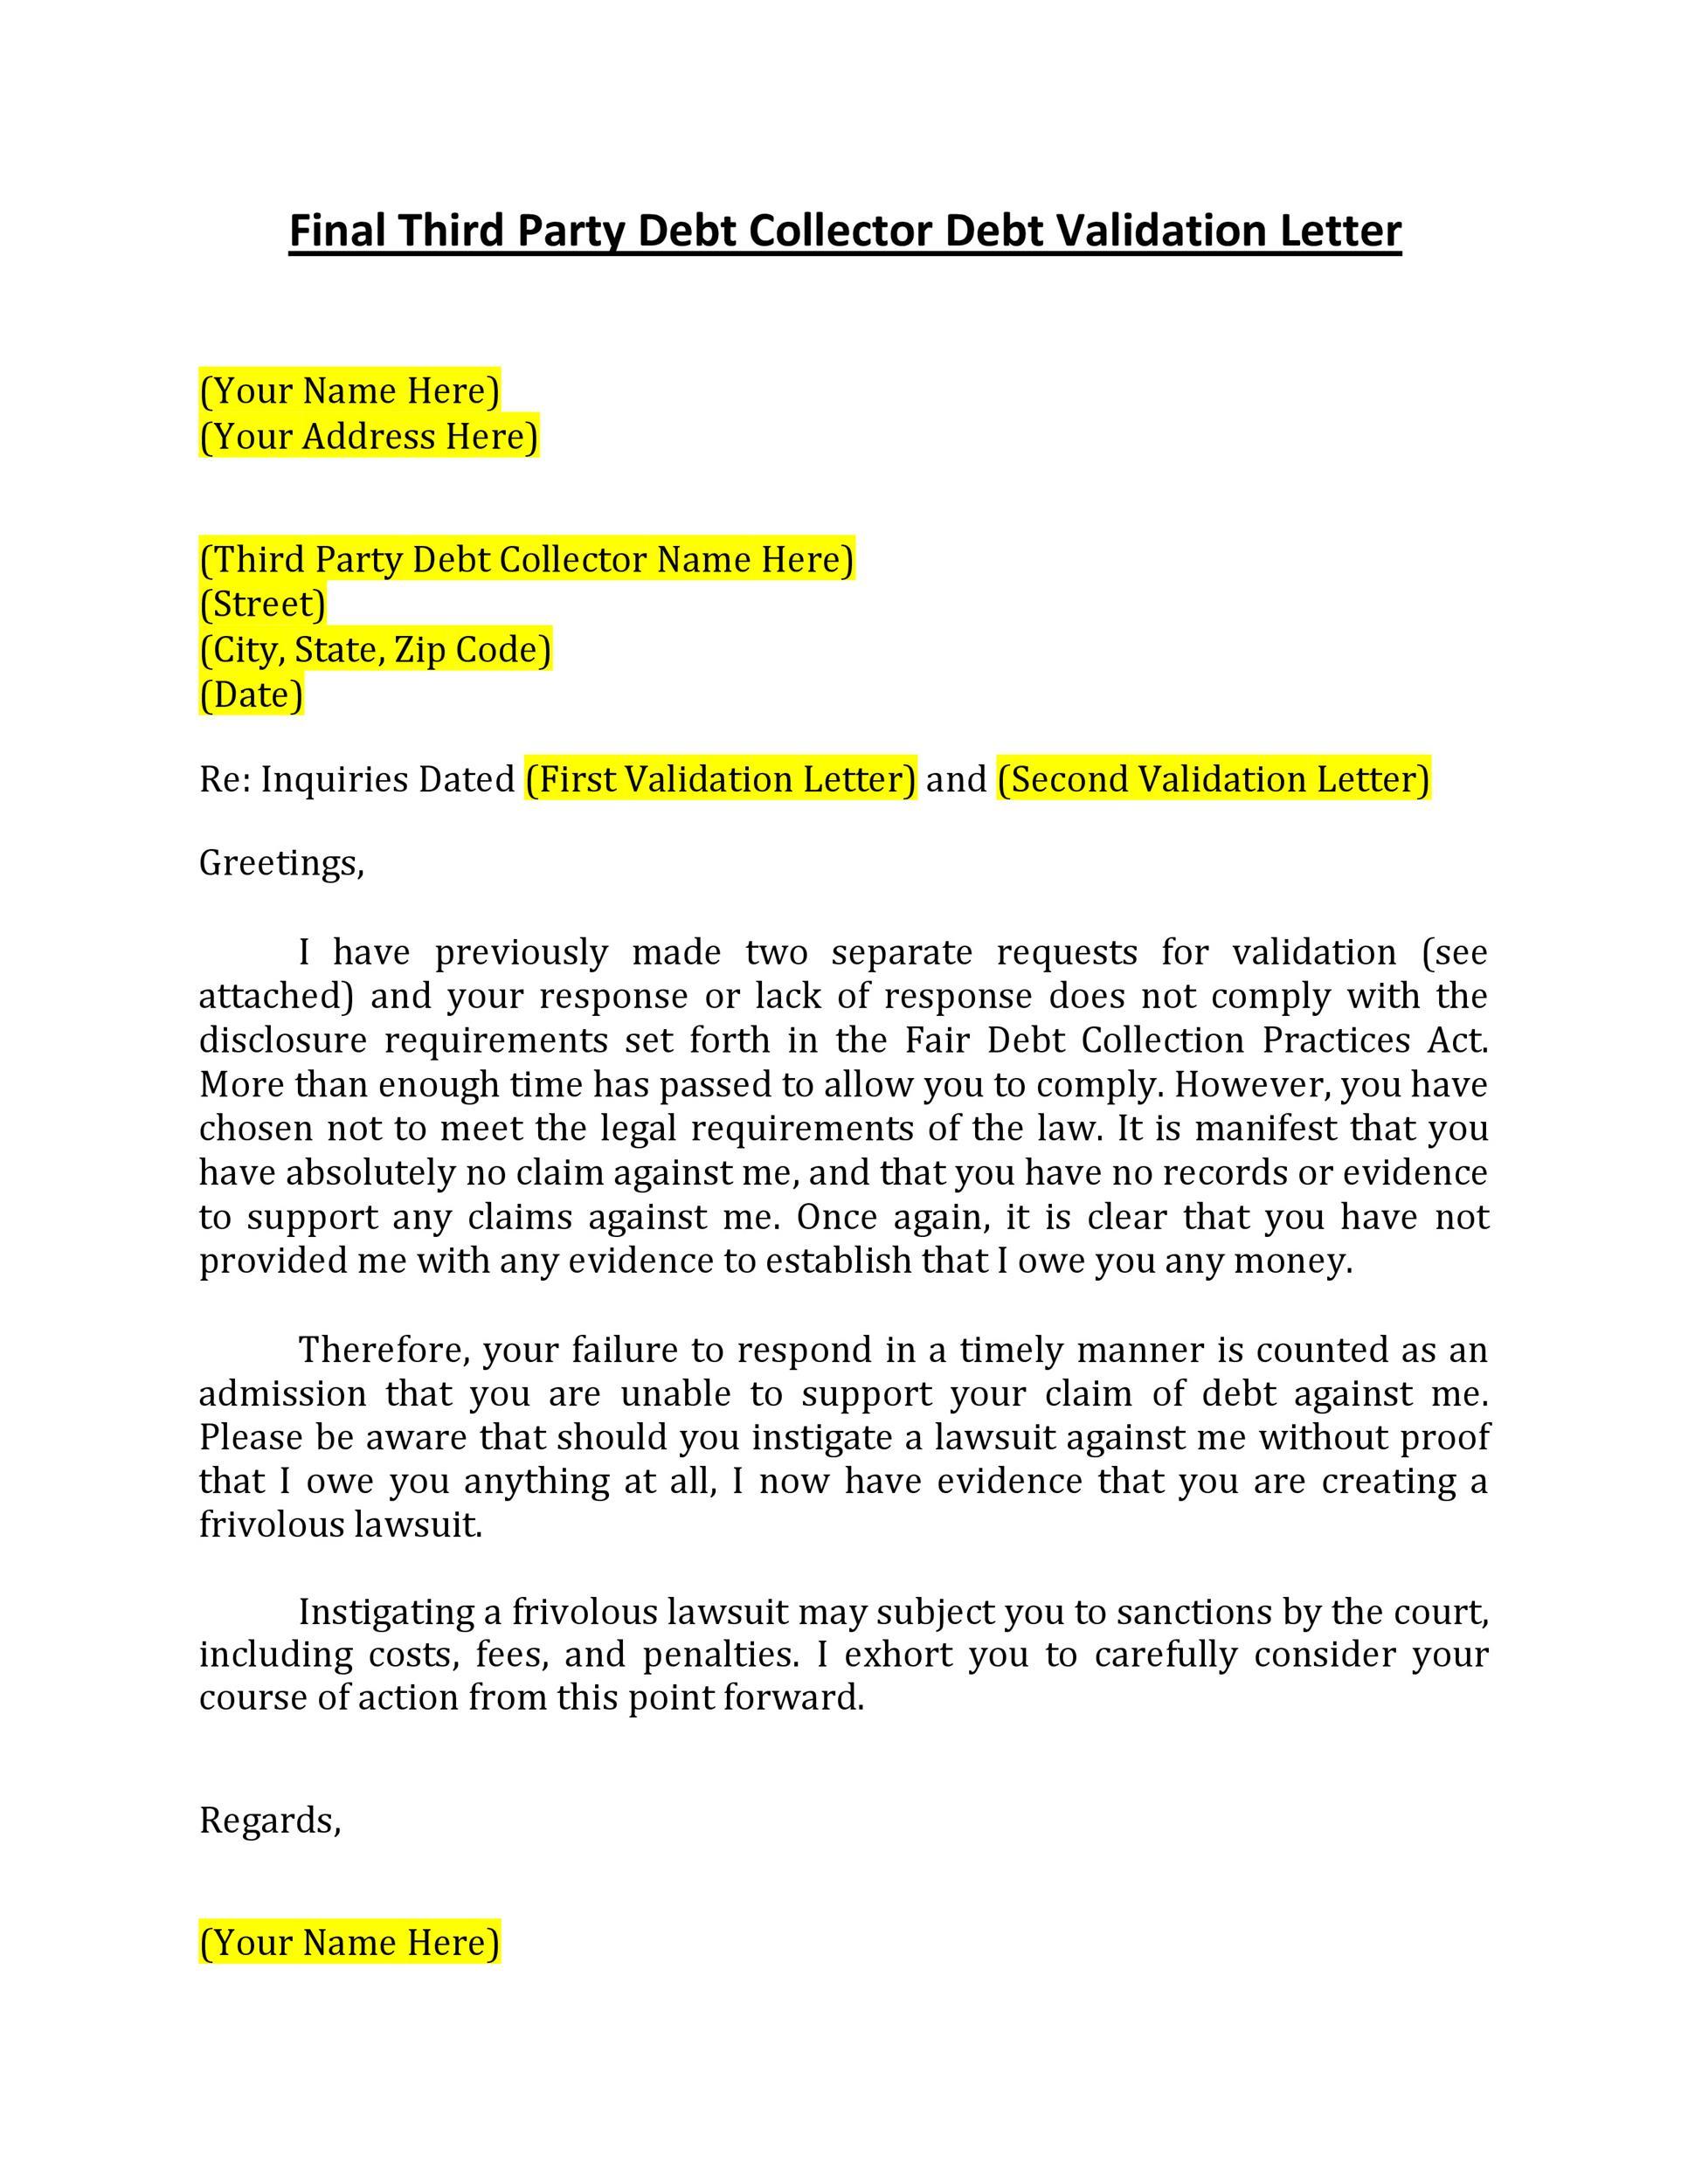 Free debt validation letter 15